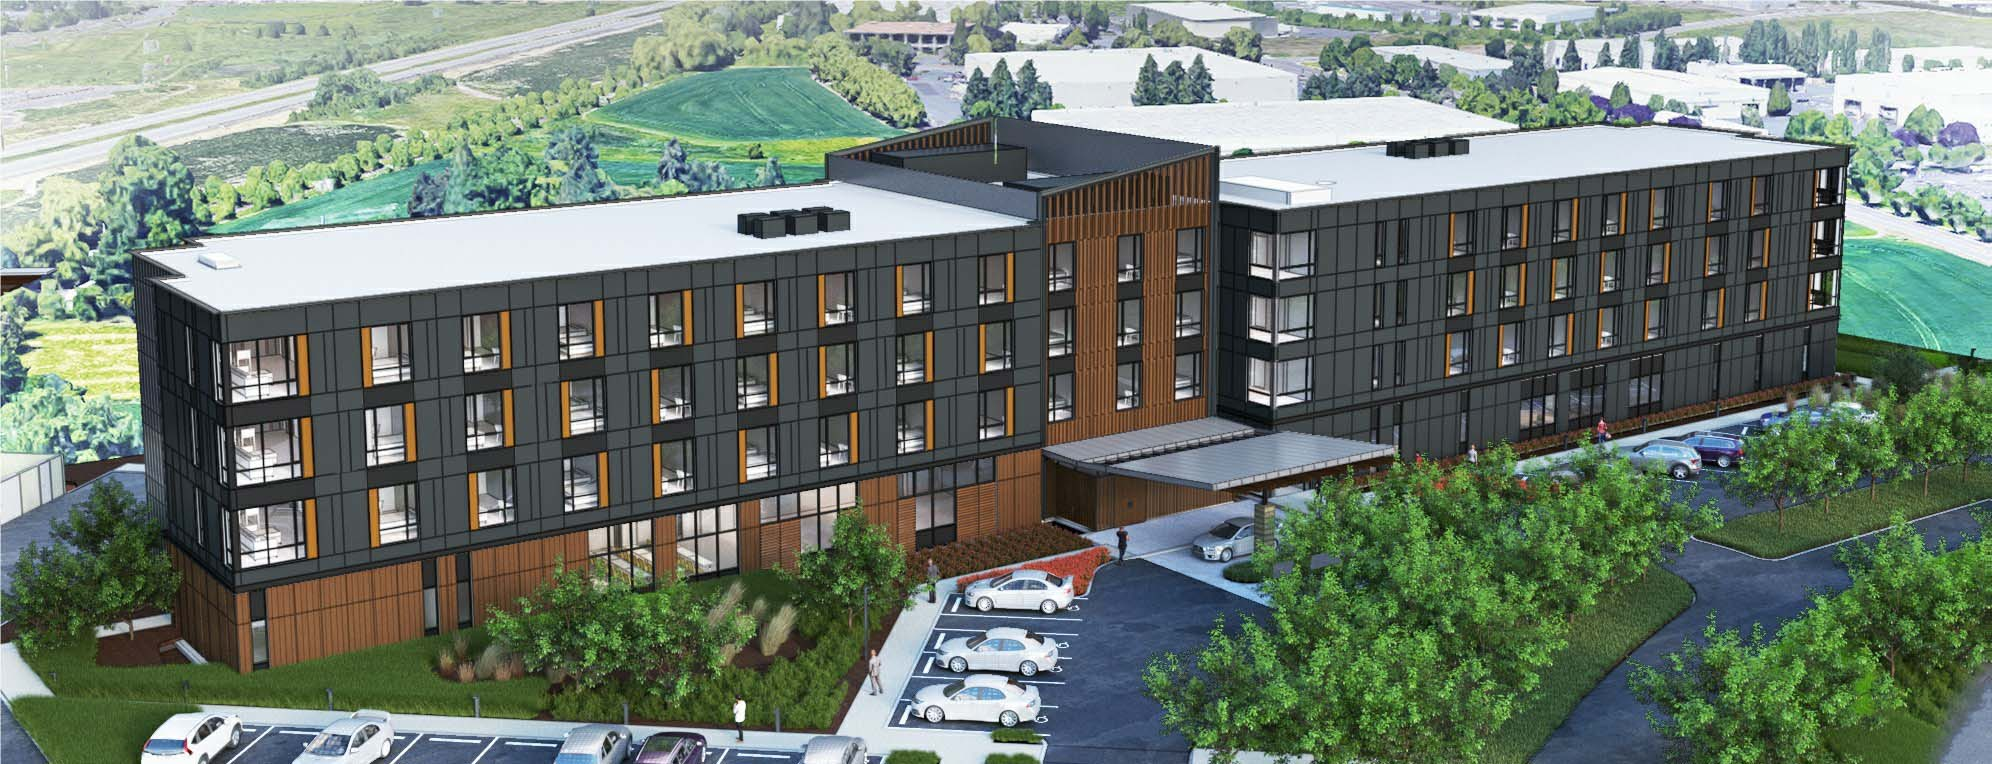 Cedartree Portland Hotel rendering